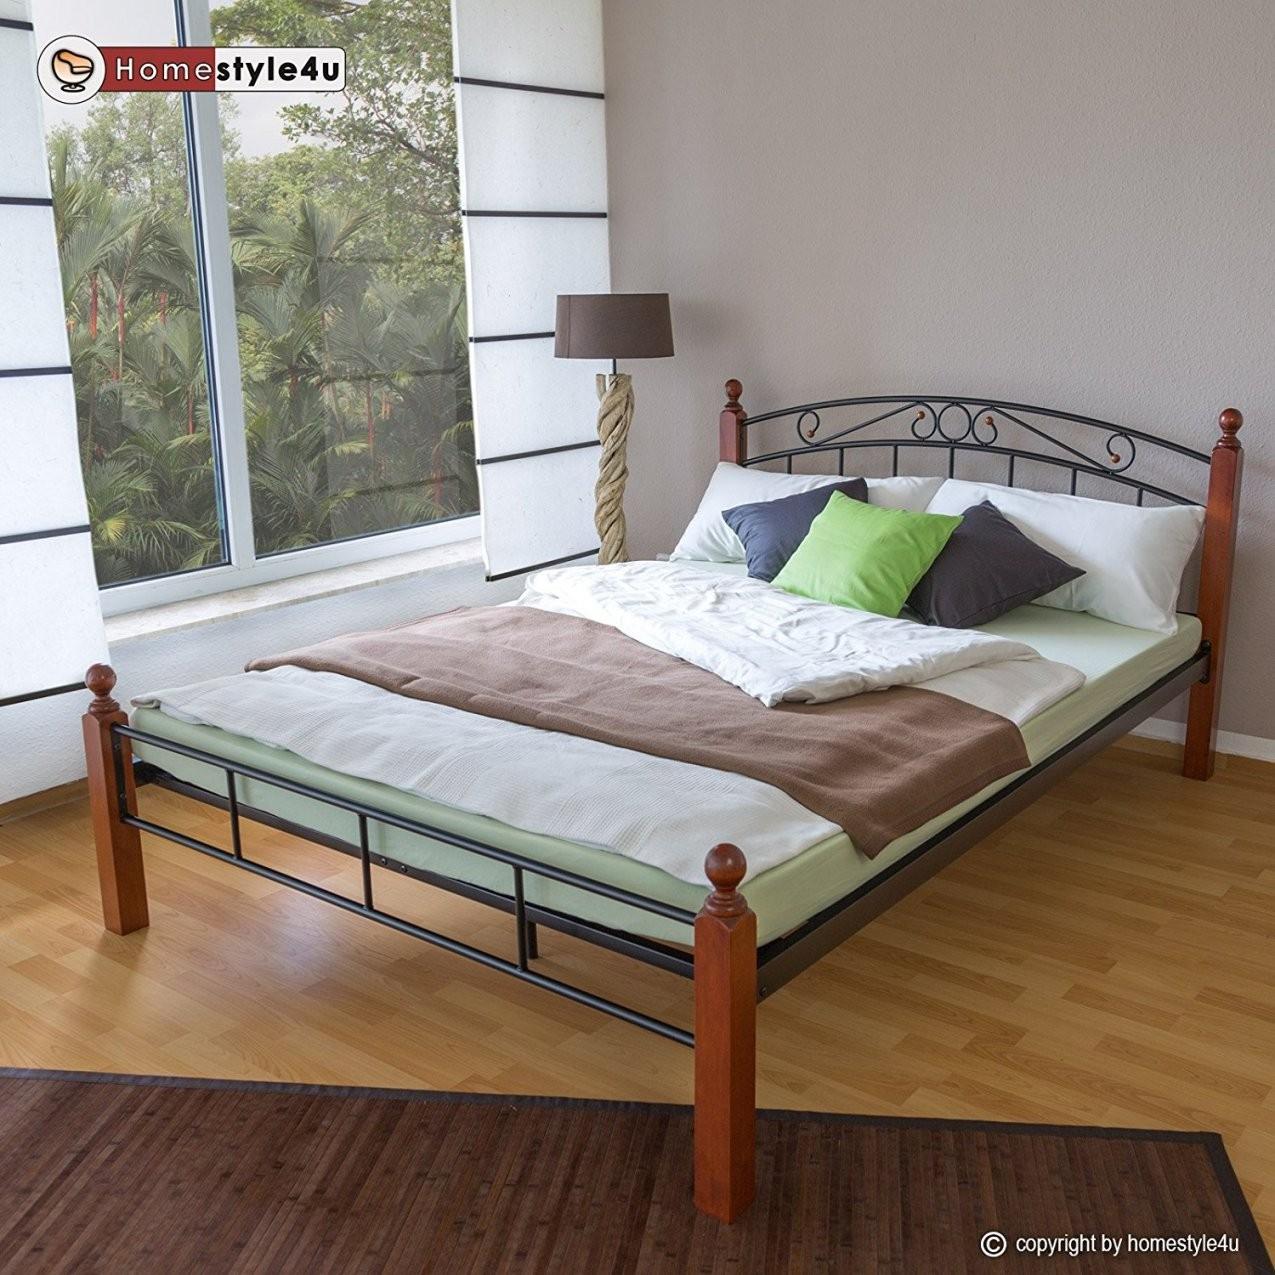 Homestyle4U Metallbett Bett Doppelbett 160 X 200 + Lattenrost von Bettgestell 160X200 Günstig Bild